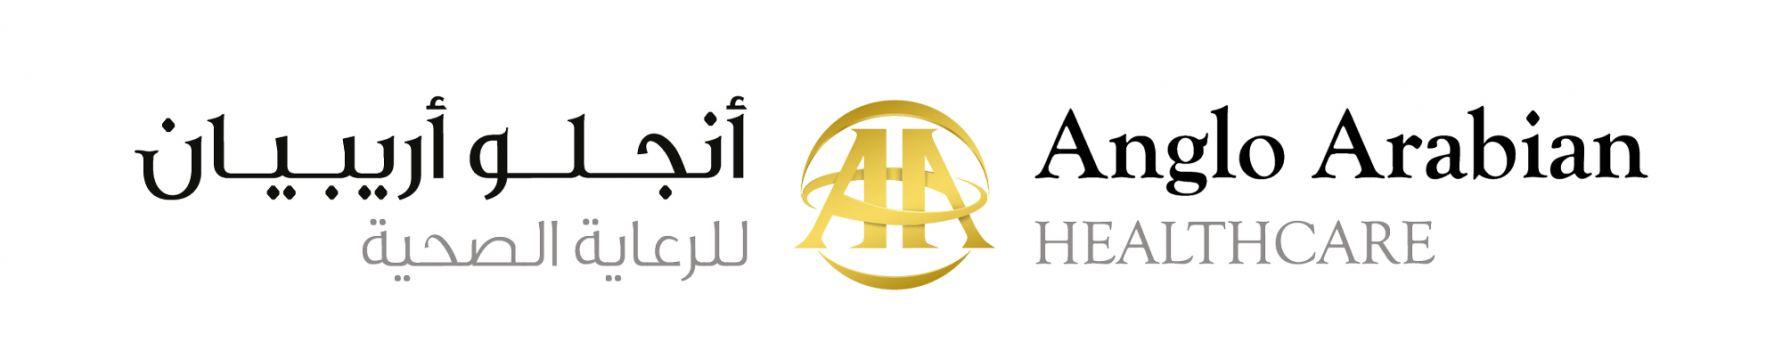 Anglo Arabian Healthcare Logo